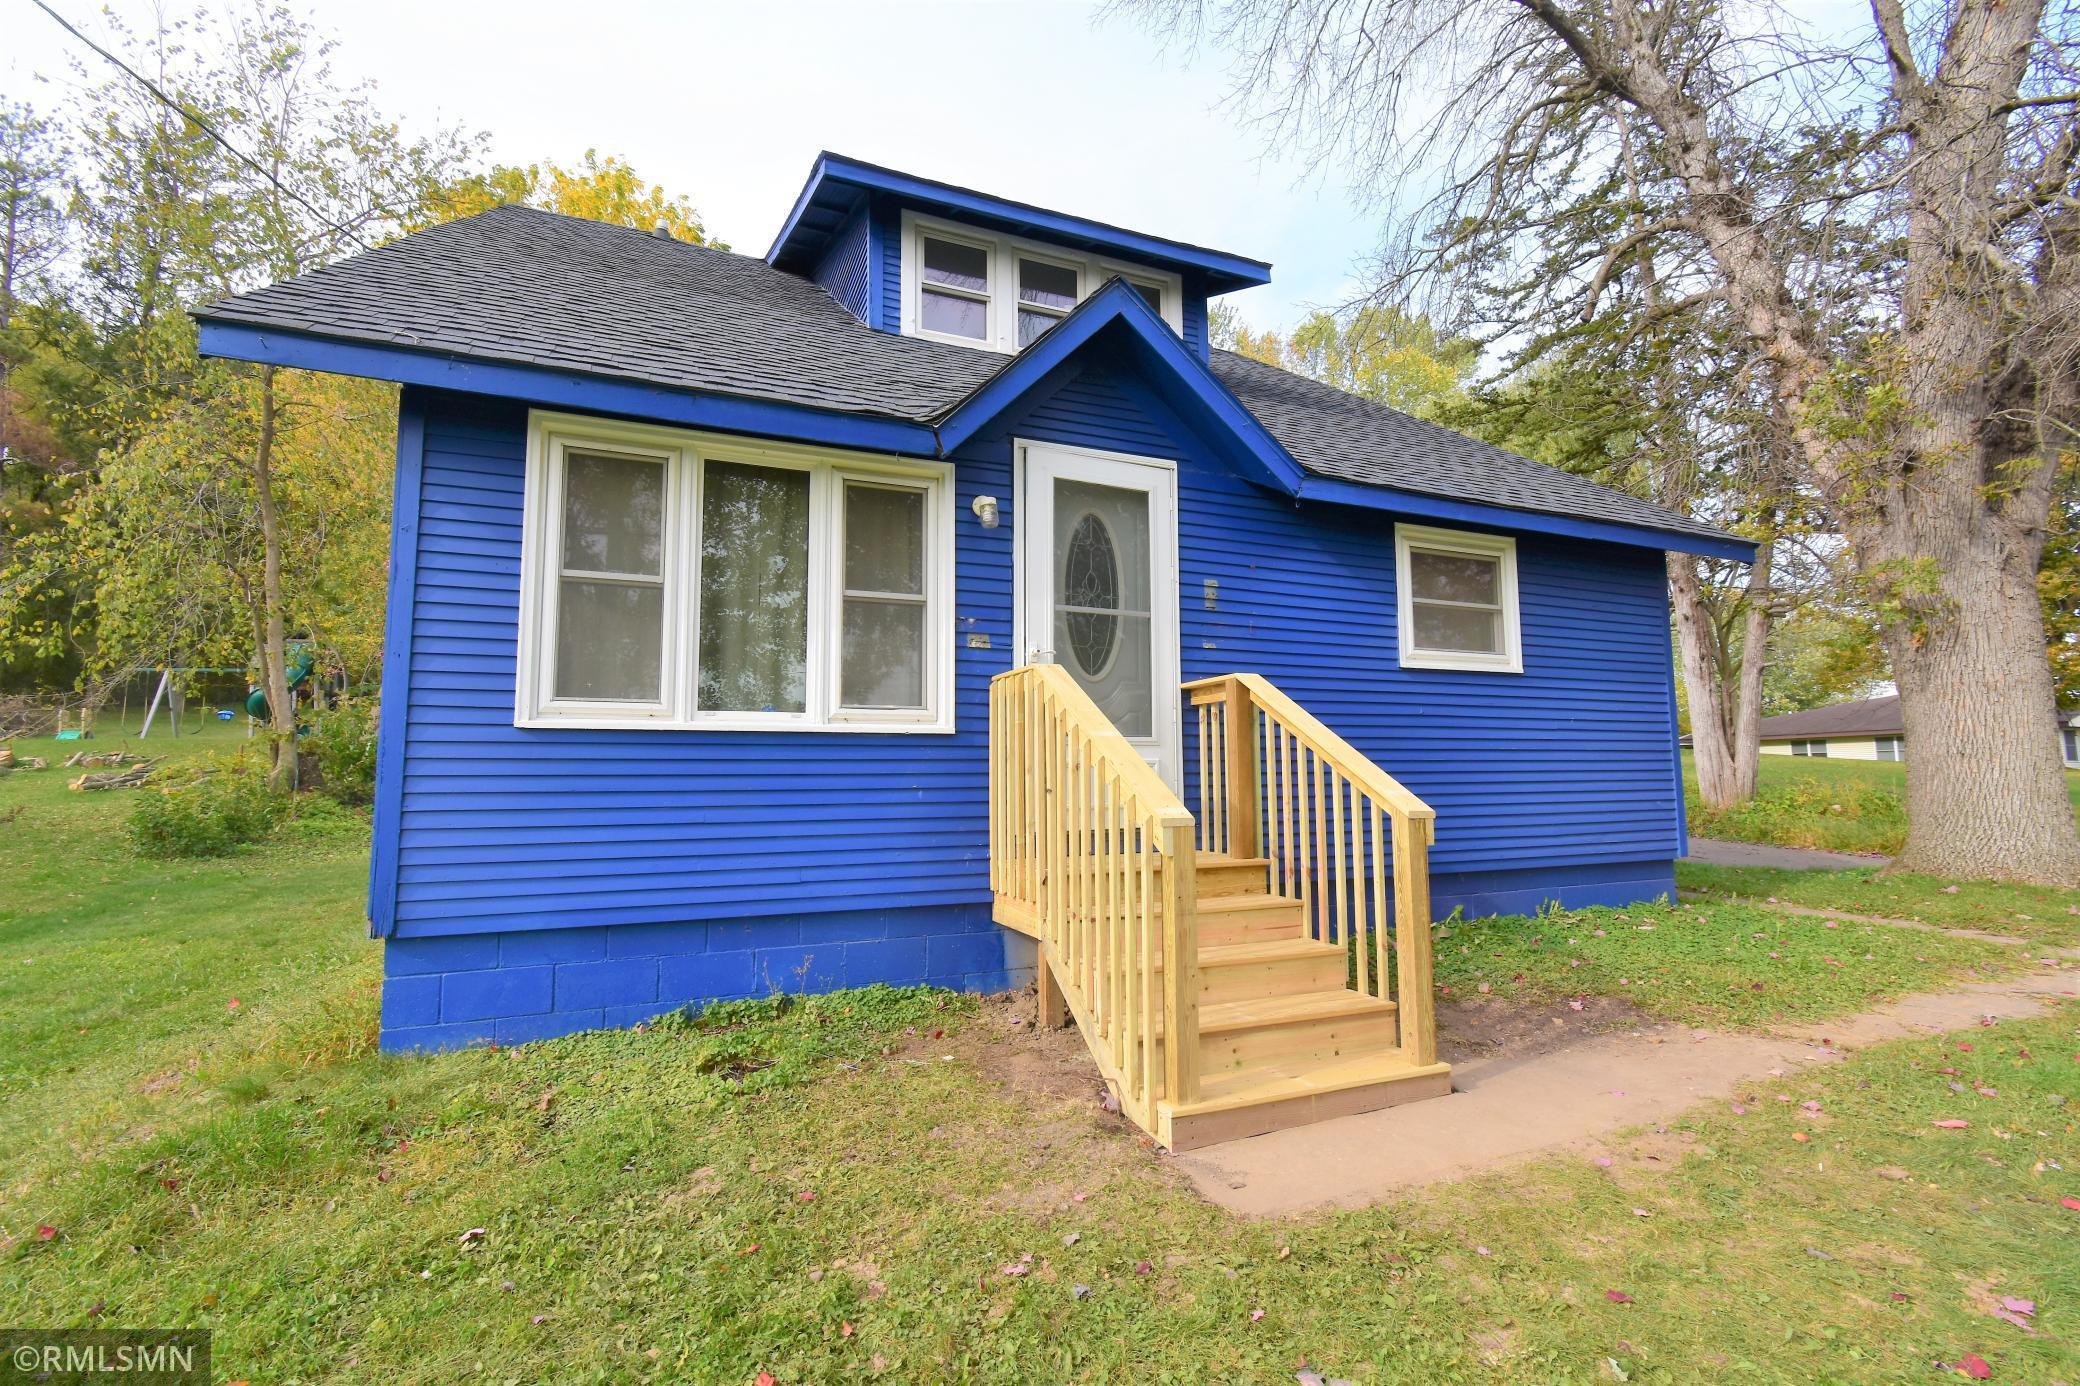 138 3rd Street, Hixton, WI 54635, 4 Bedrooms Bedrooms, ,2 BathroomsBathrooms,Residential,For Sale,3rd,NST6110070